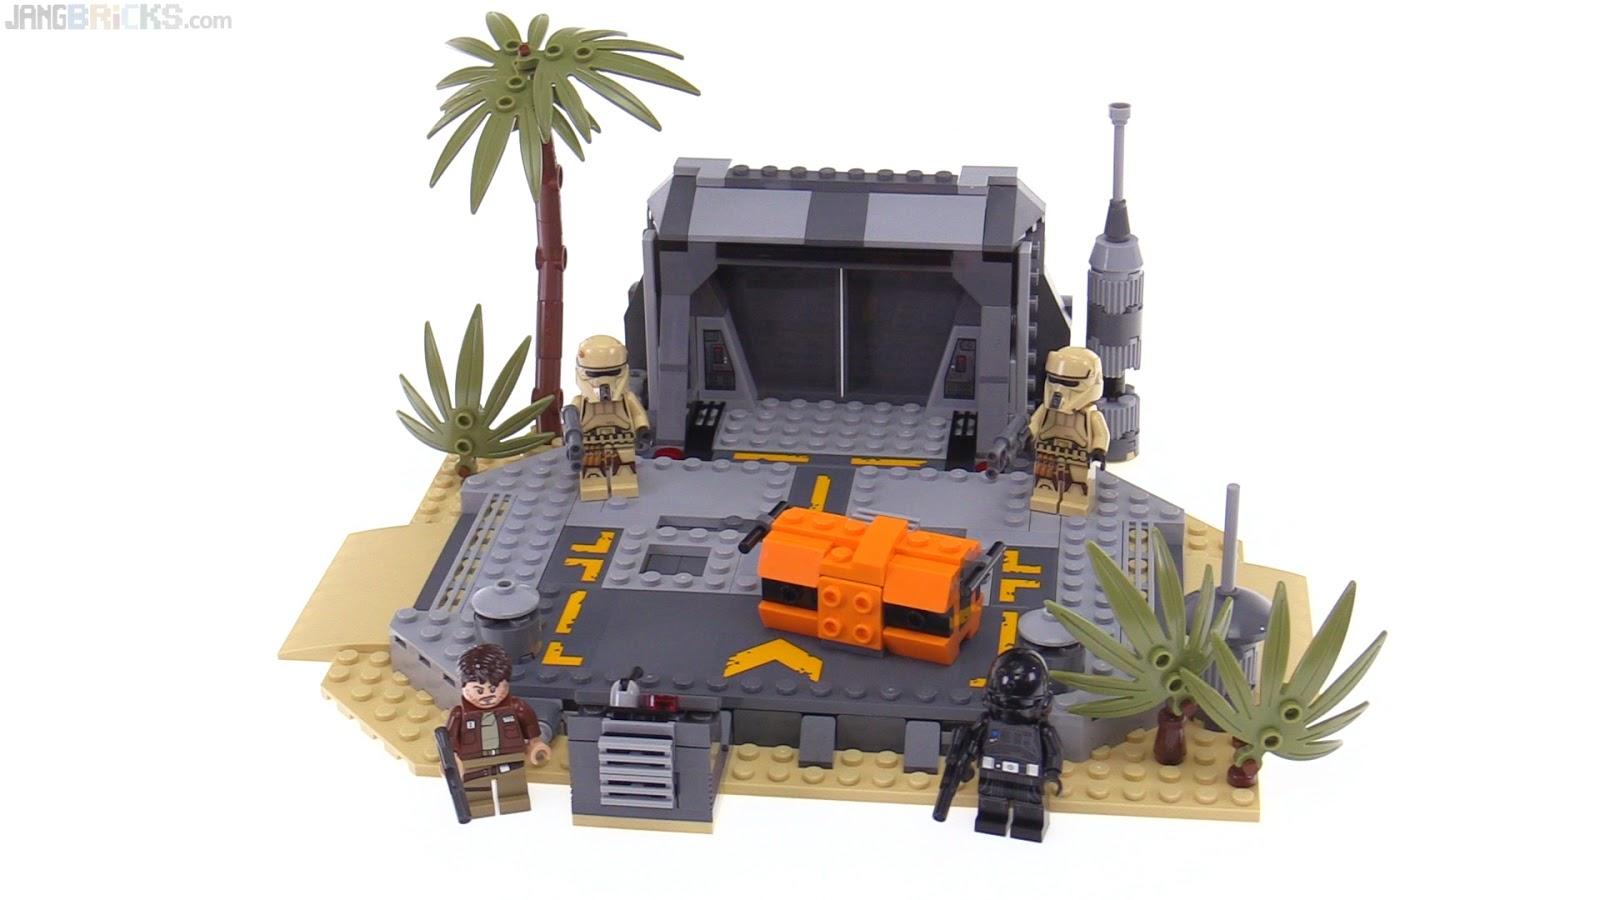 lego star wars rogue one battle on scarif review 75171. Black Bedroom Furniture Sets. Home Design Ideas